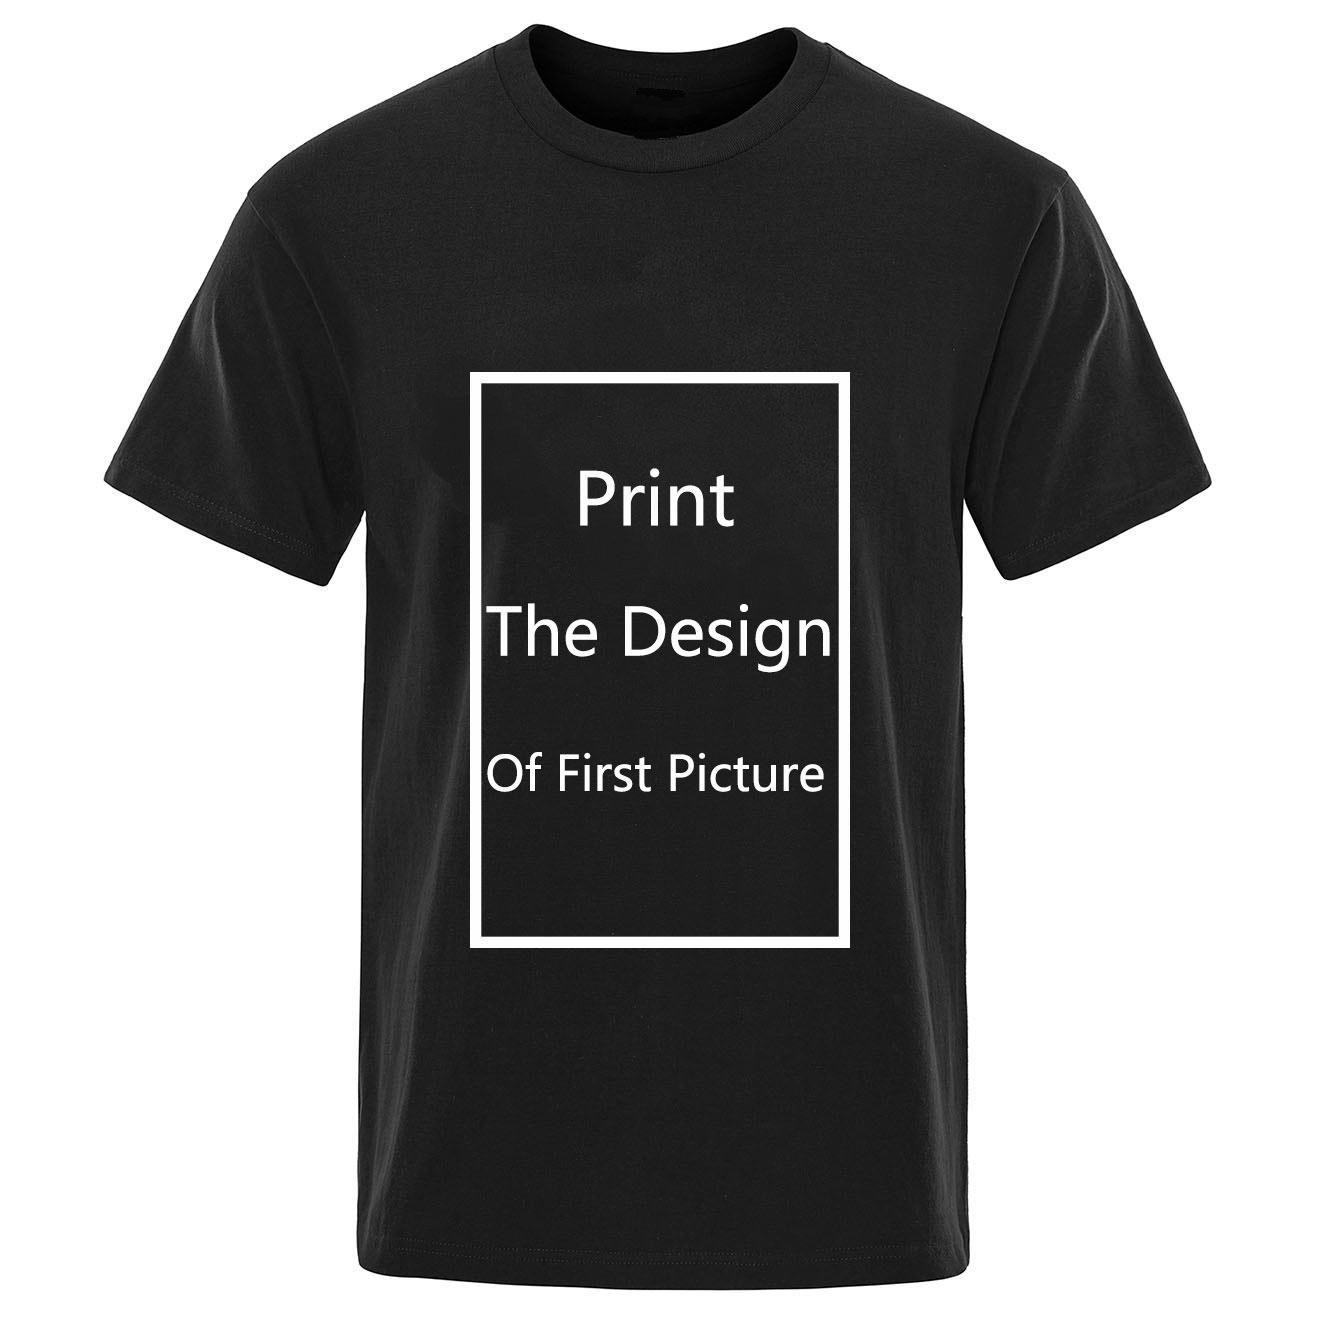 Nuovi arrivi 2019 Moda Never Summer Uomo rinunciare design manica corta T-shirt fredda soft top Tee